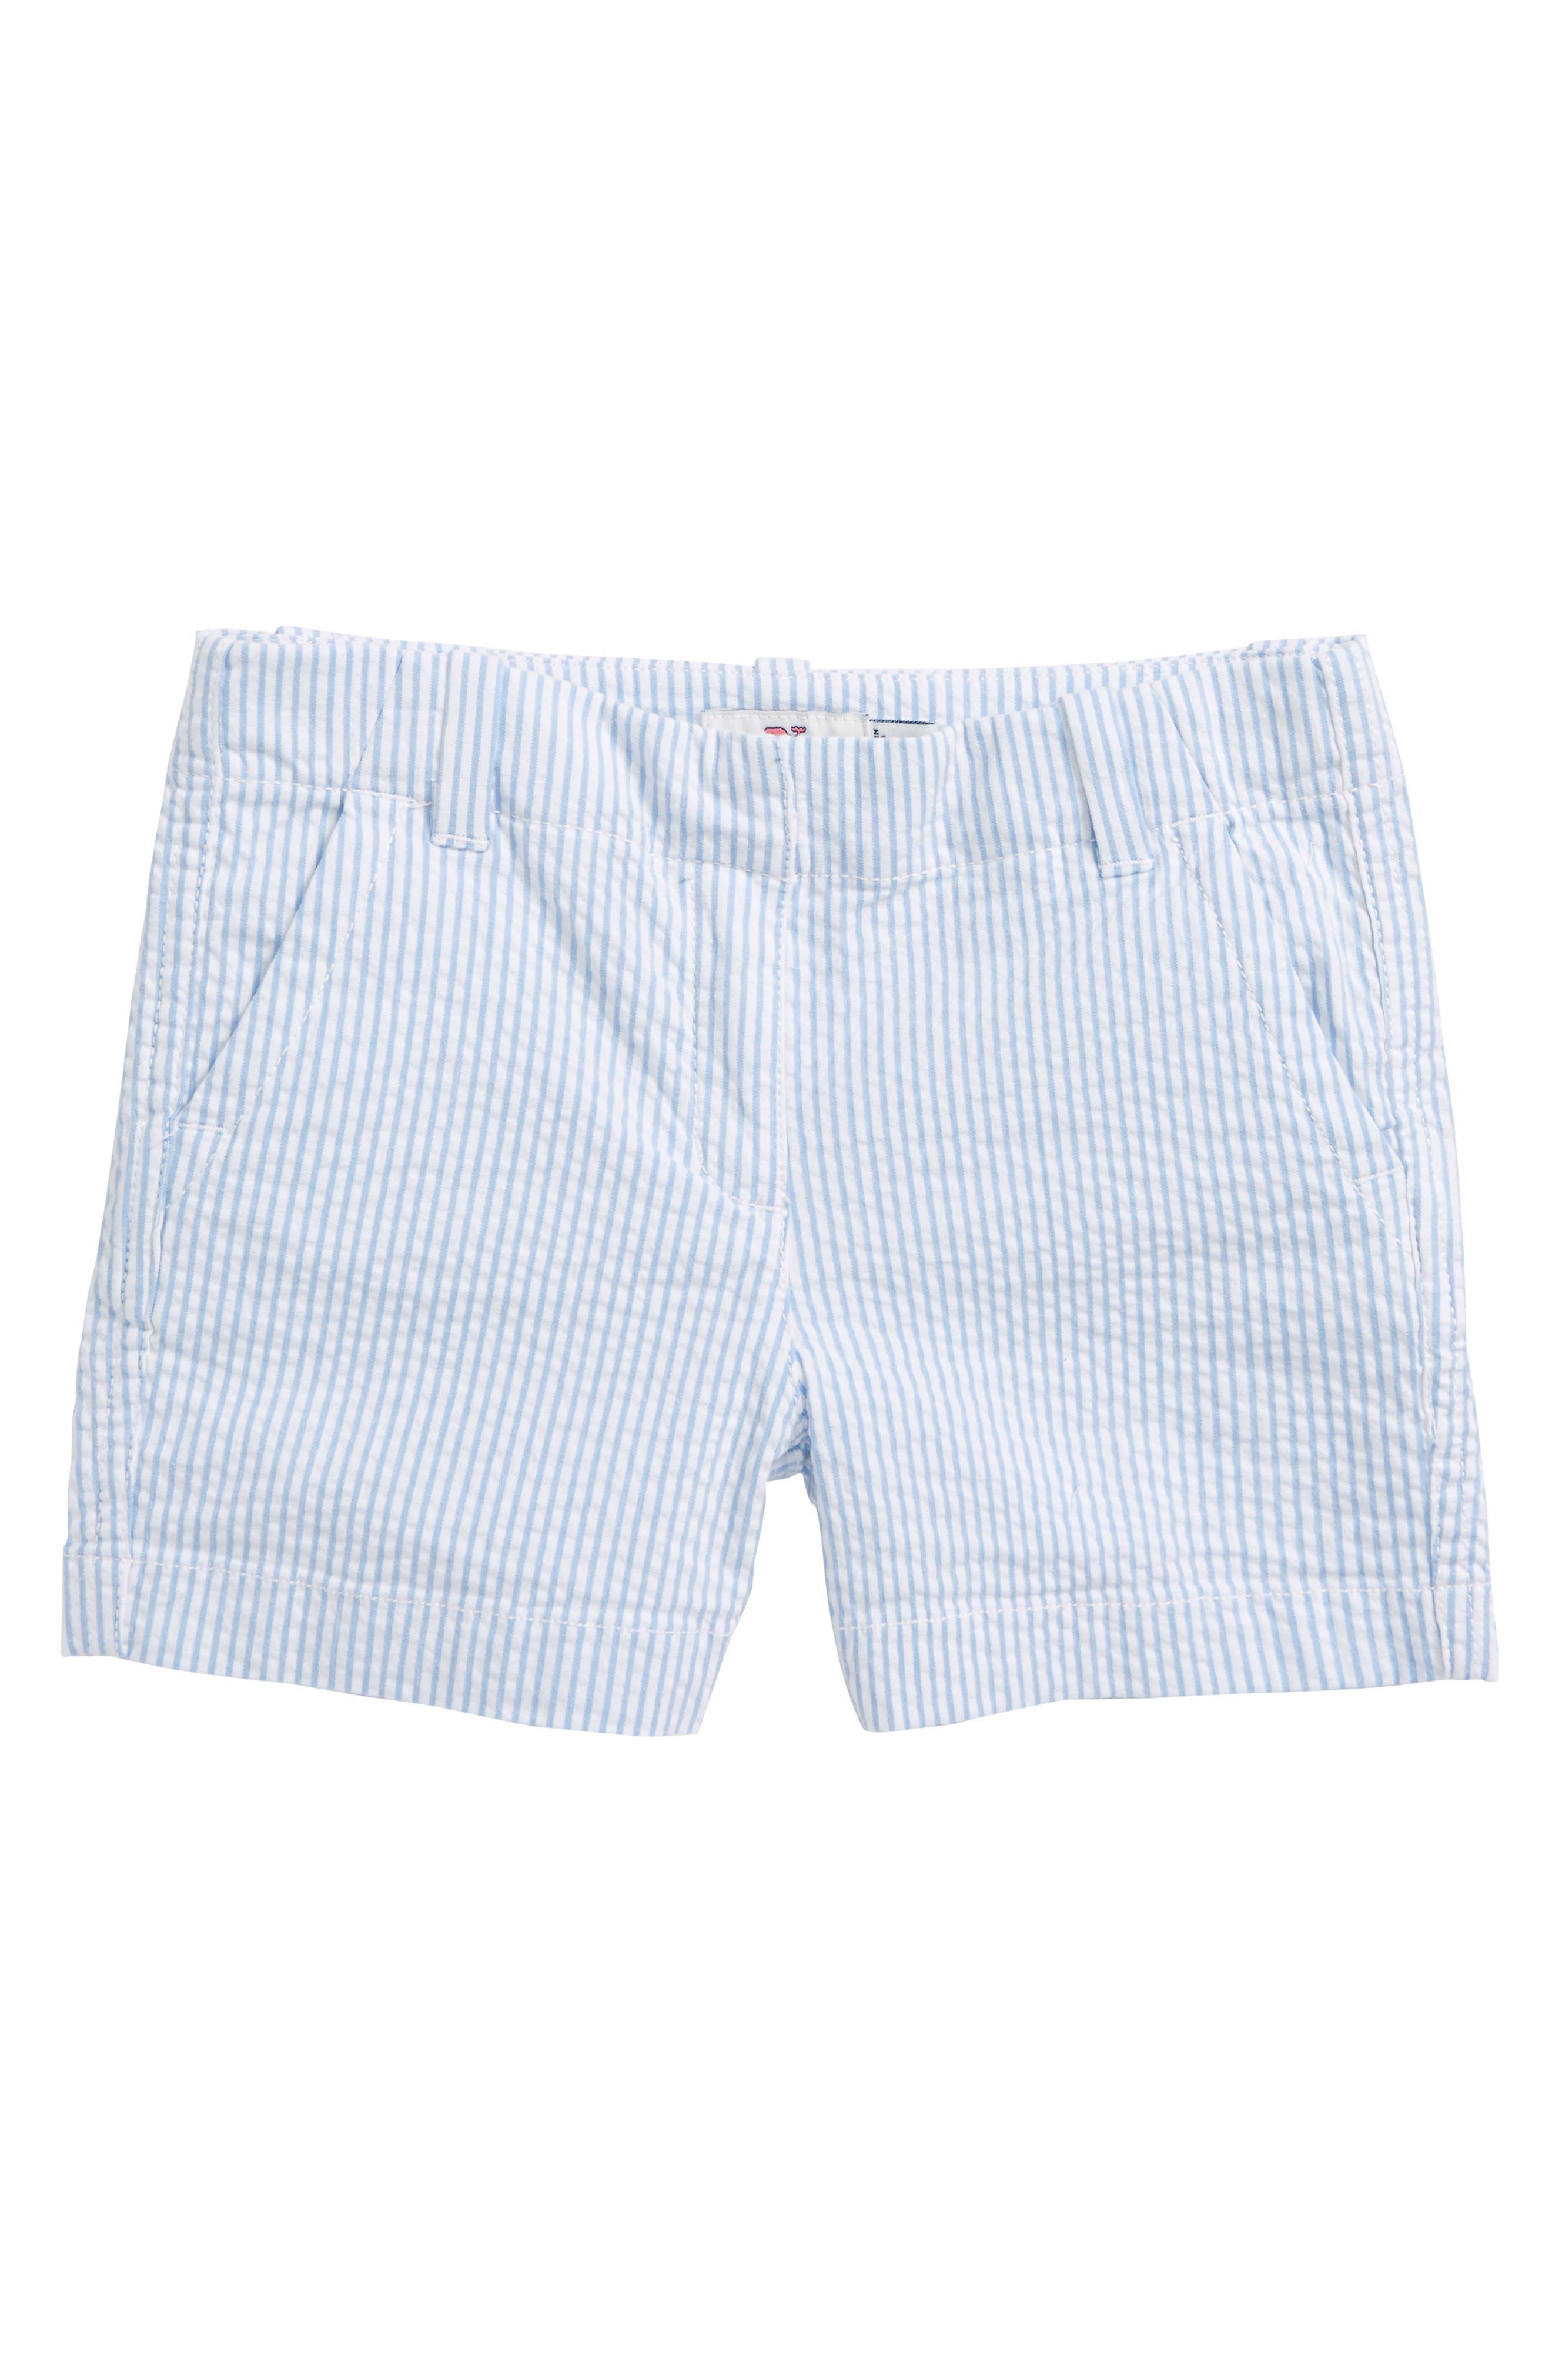 Seersucker Everyday Shorts,                             Main thumbnail 1, color,                             484